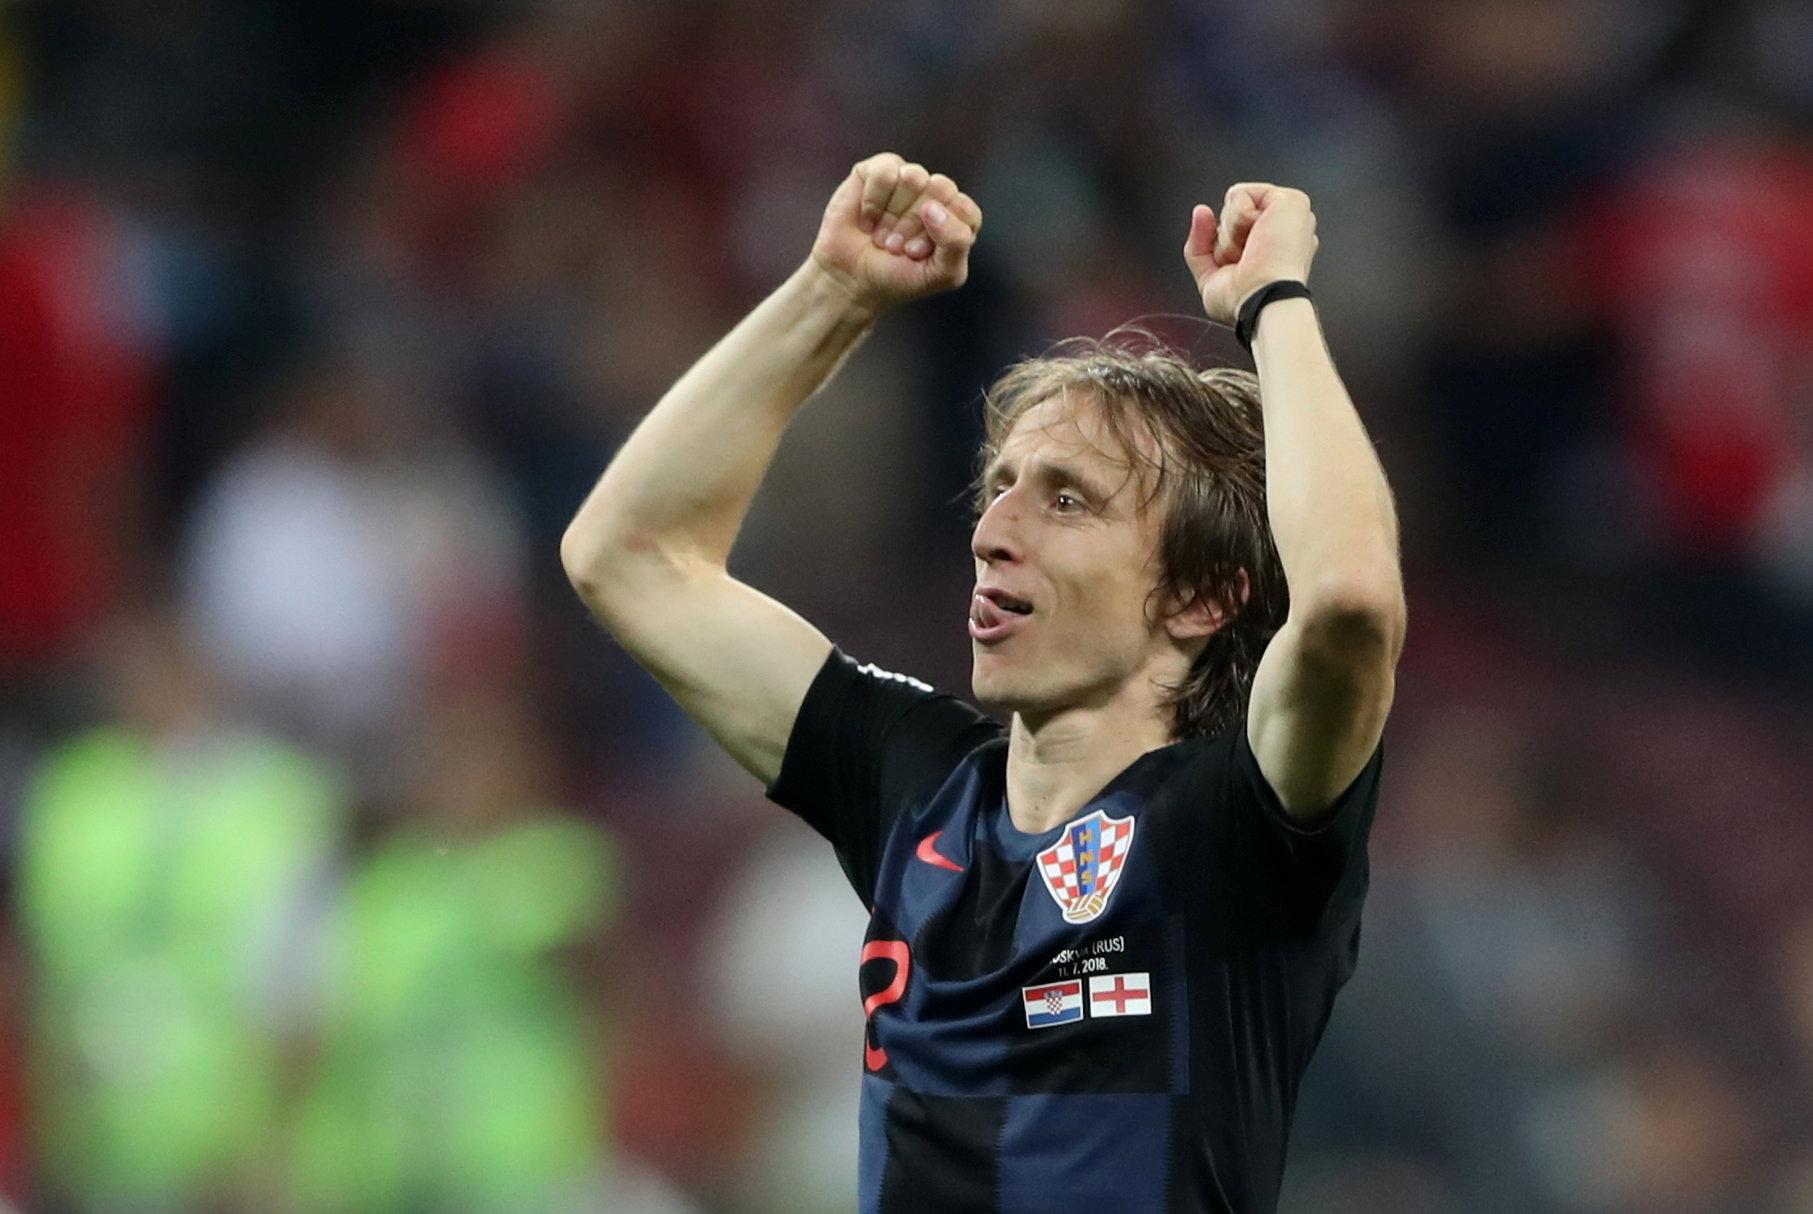 Soccer Football - World Cup - Semi Final - Croatia v England - Luzhniki Stadium, Moscow, Russia - July 11, 2018  Croatia's Luka Modric celebrates after the match   REUTERS/Carl Recine